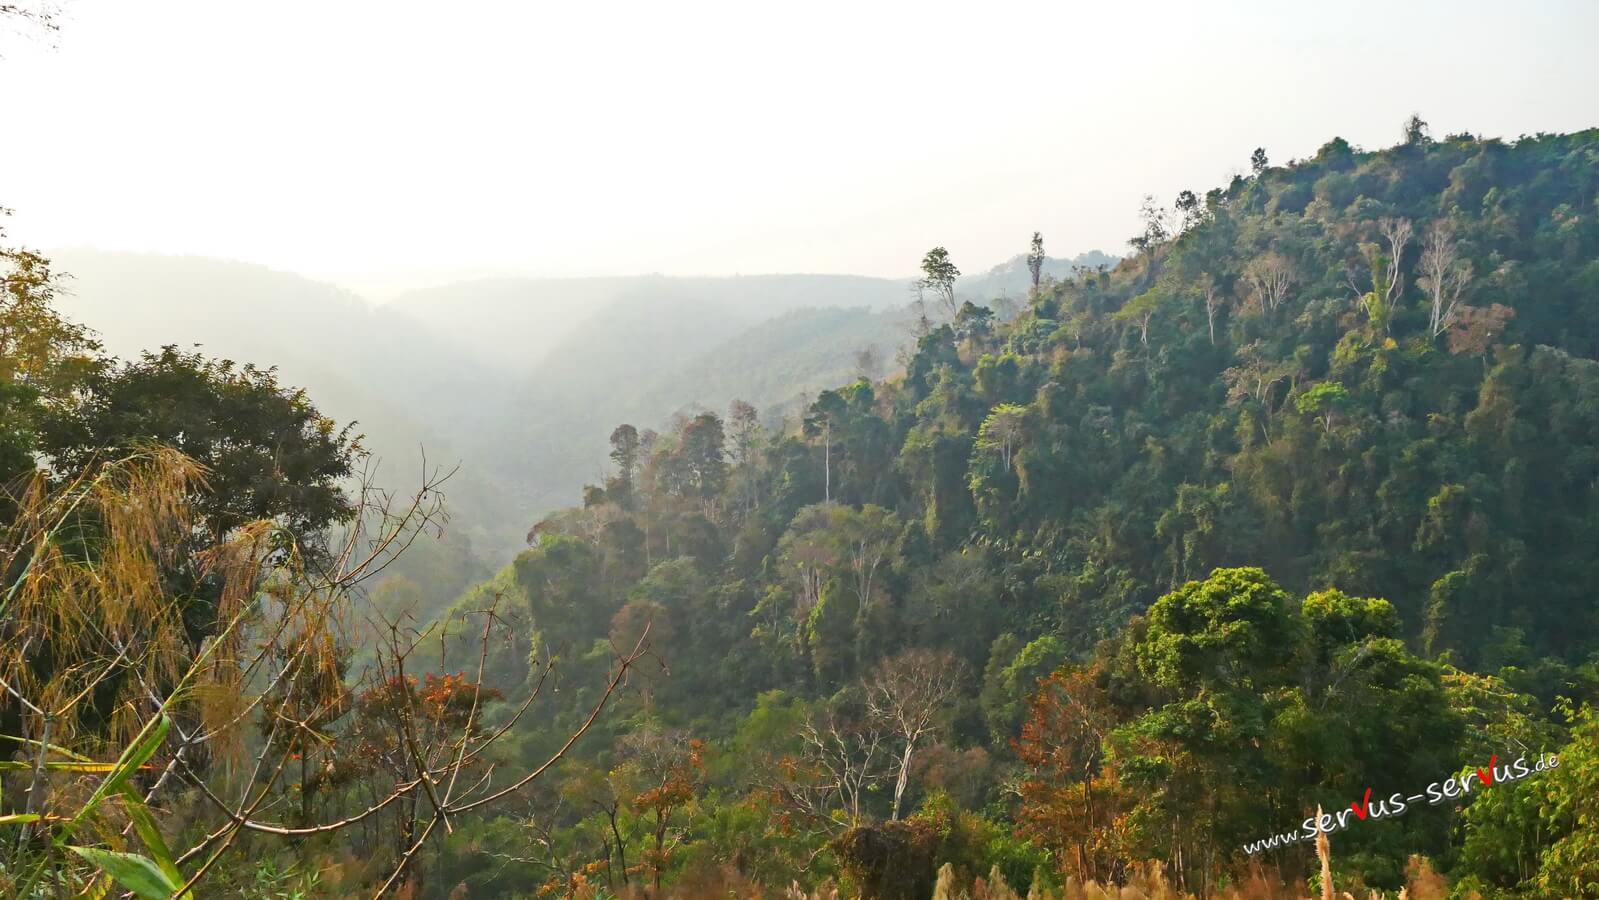 Dschungel, Berge, Laos, Bolavenplateau